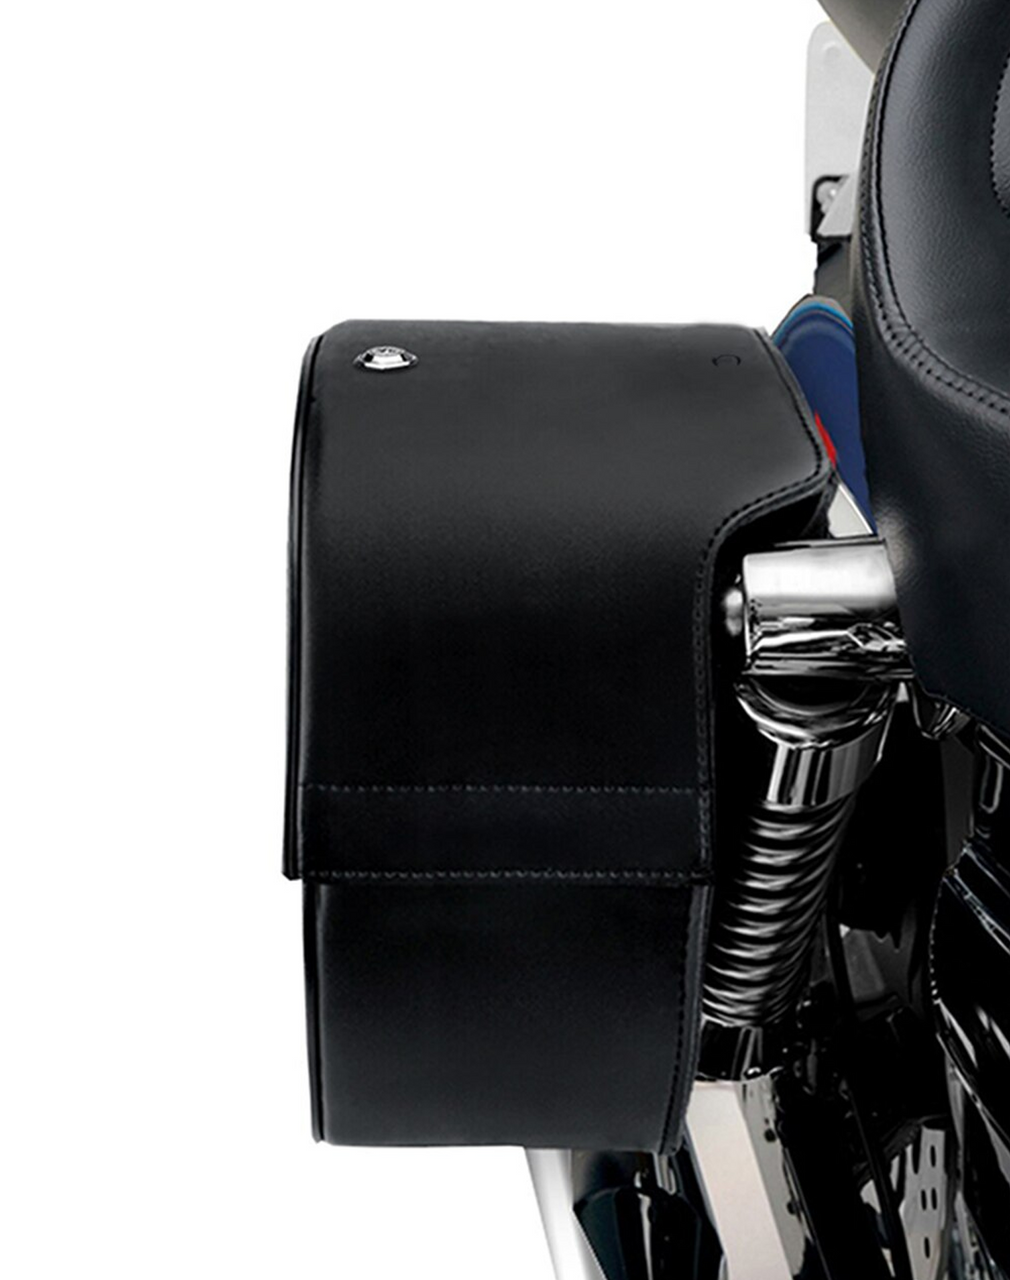 Honda Rebel 500 Warrior Shock Cutout Large Motorcycle Saddlebags Shock Cutout View